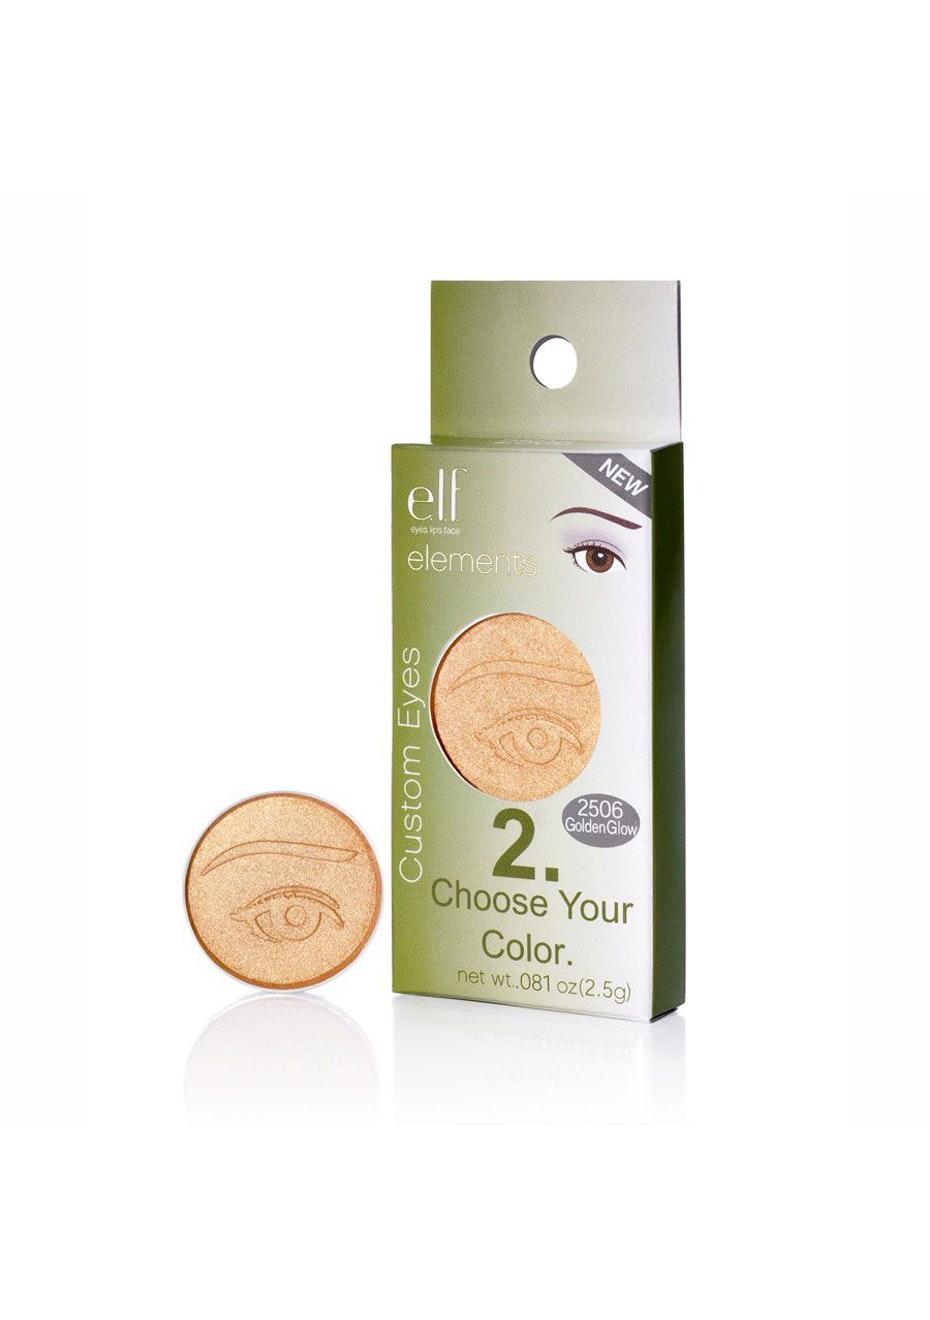 e.l.f Essentials Elem Eye Golden Glo 2506